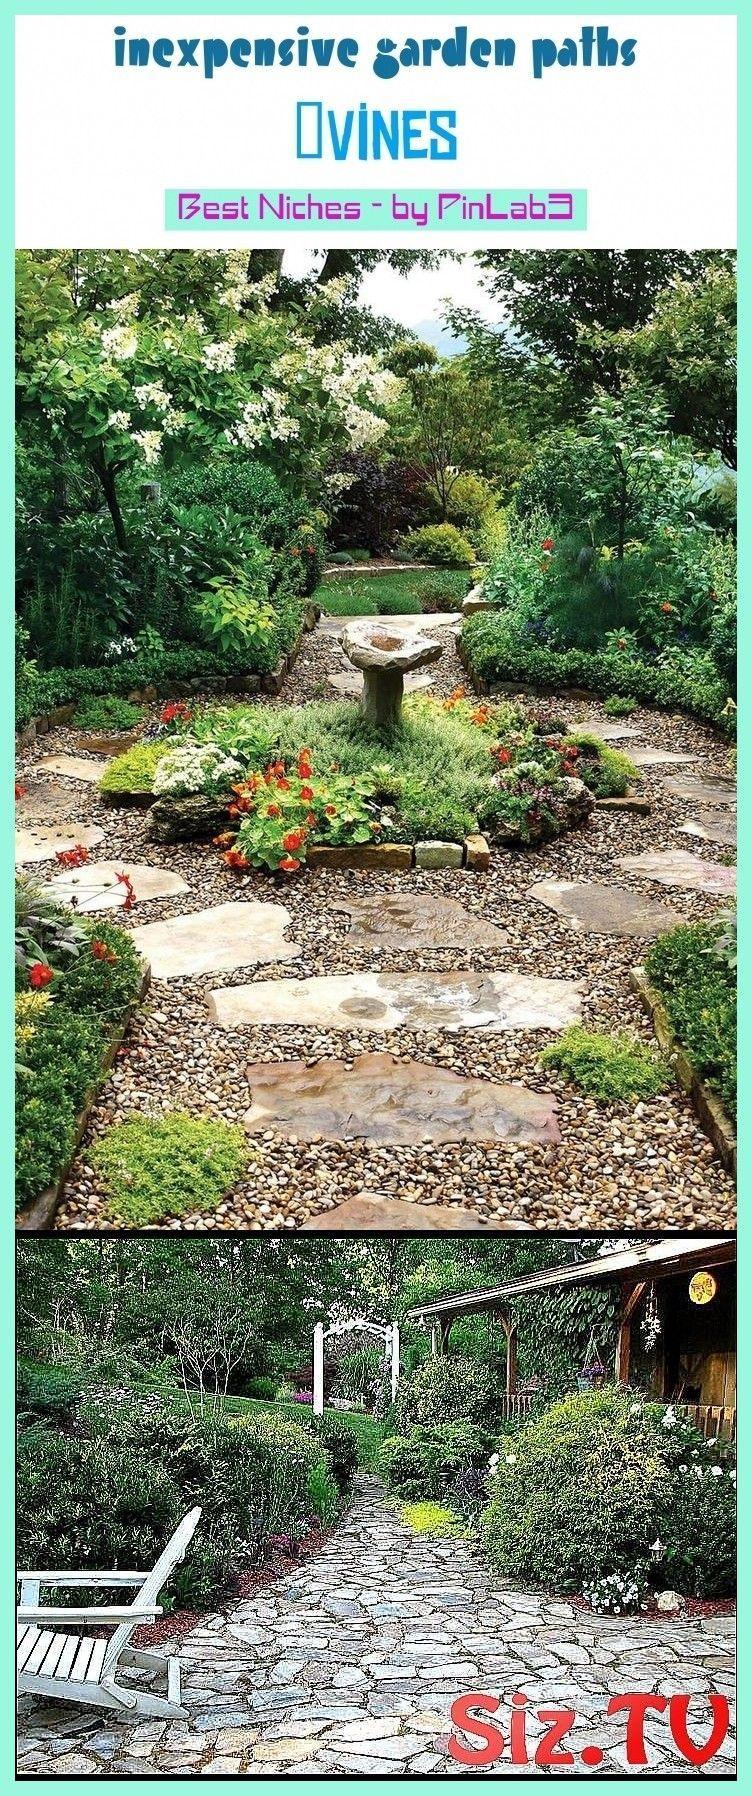 Inexpensive garden paths garden paths and walkways